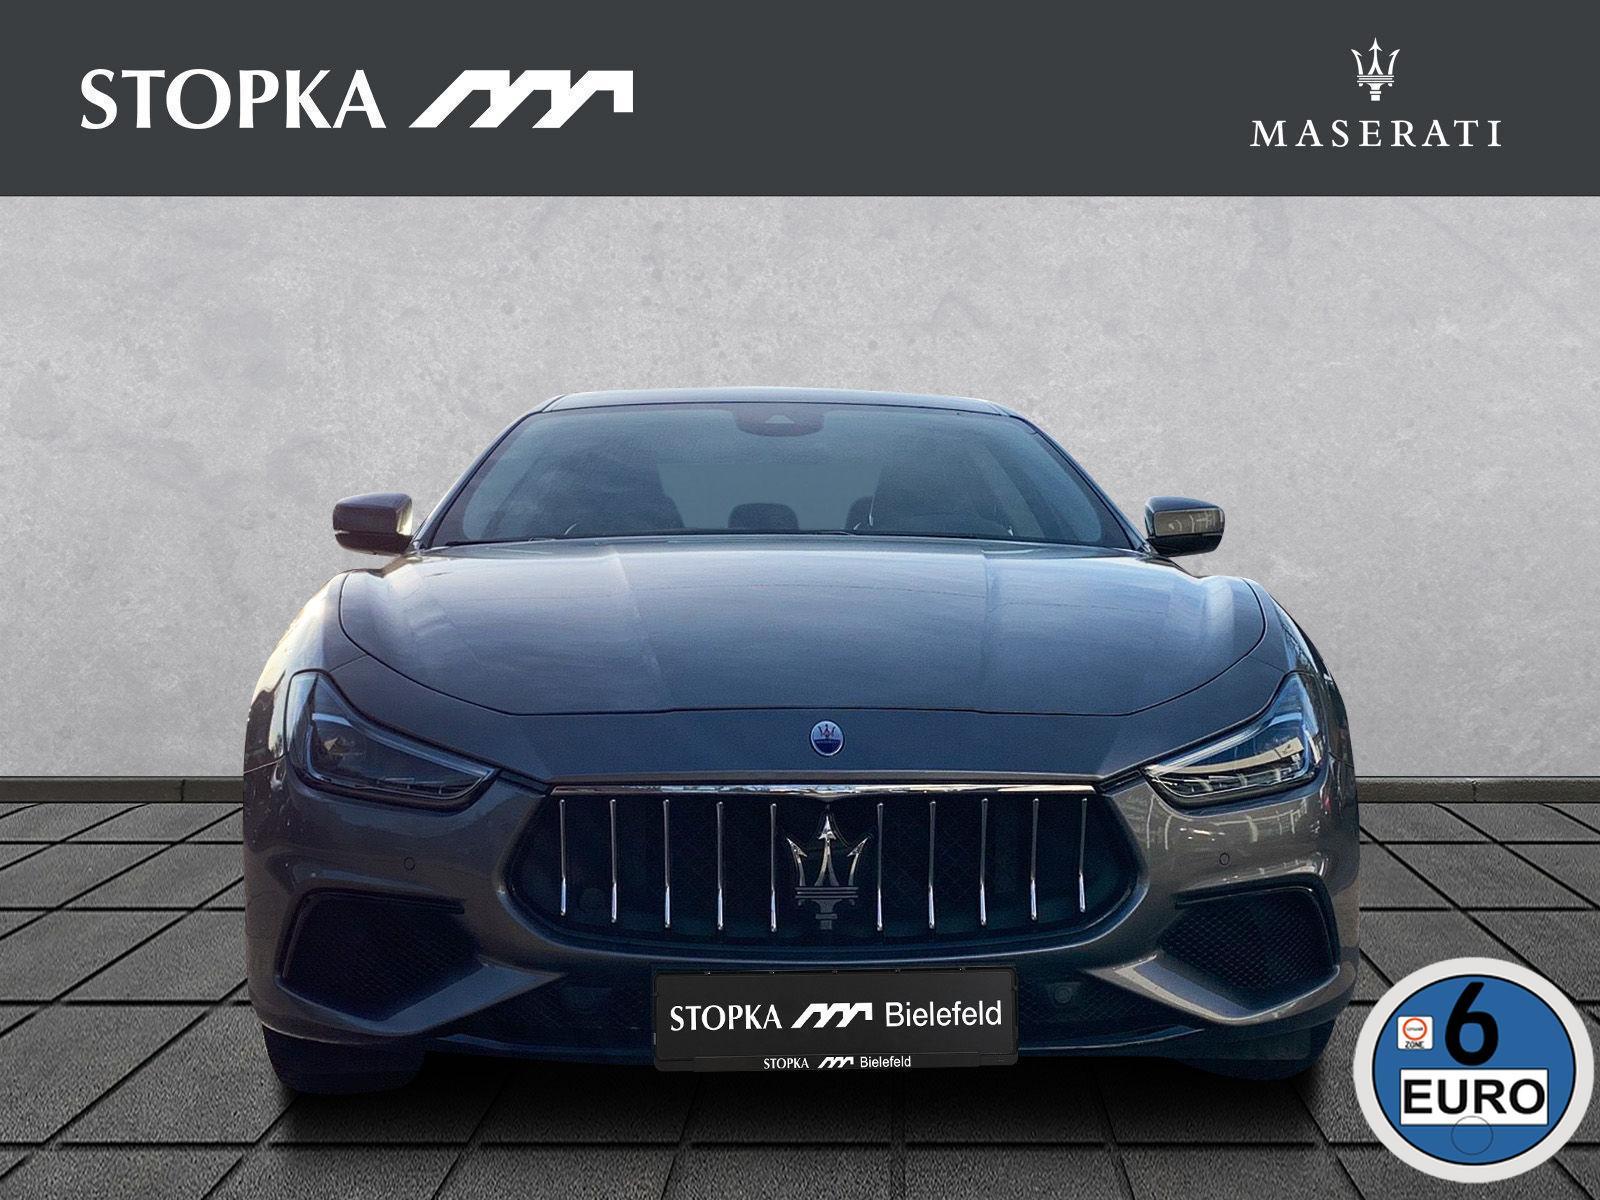 Maserati Ghibli Diesel GranSport*UPE 94.400*ACC*20Zoll*SD, Jahr 2018, Diesel